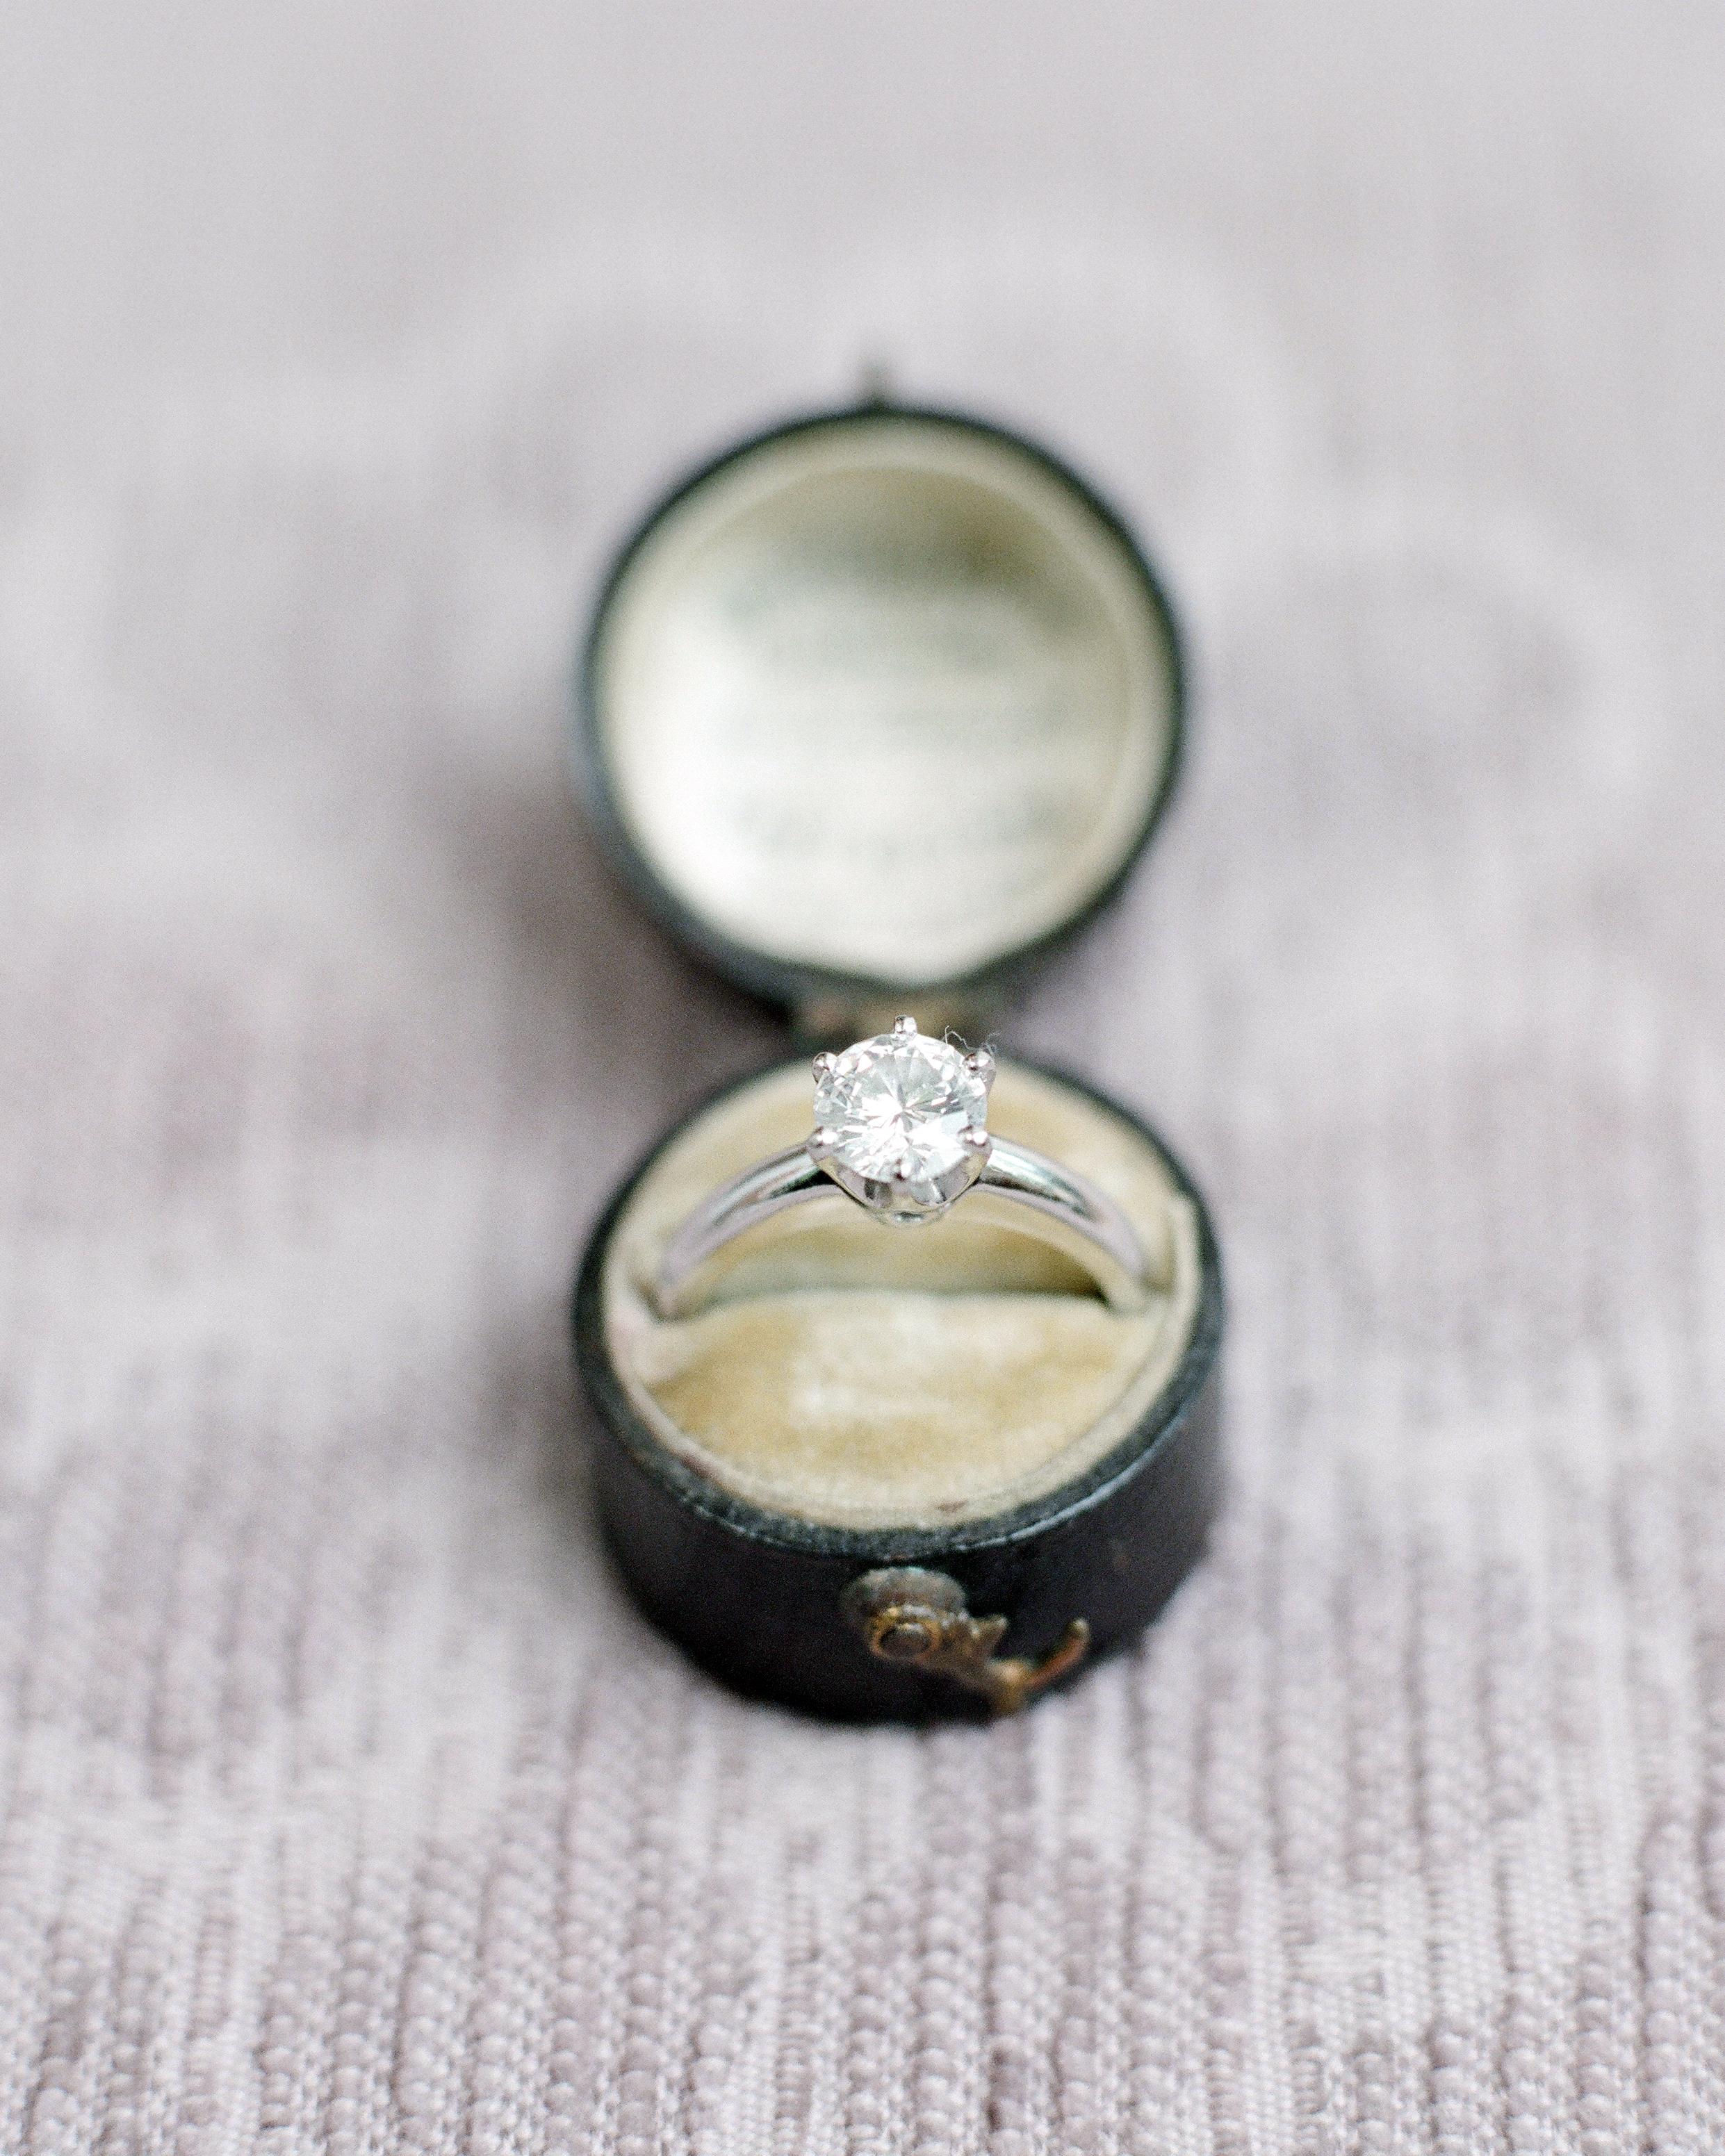 brittany-jeff-wedding-rings-017-s111415-0714.jpg